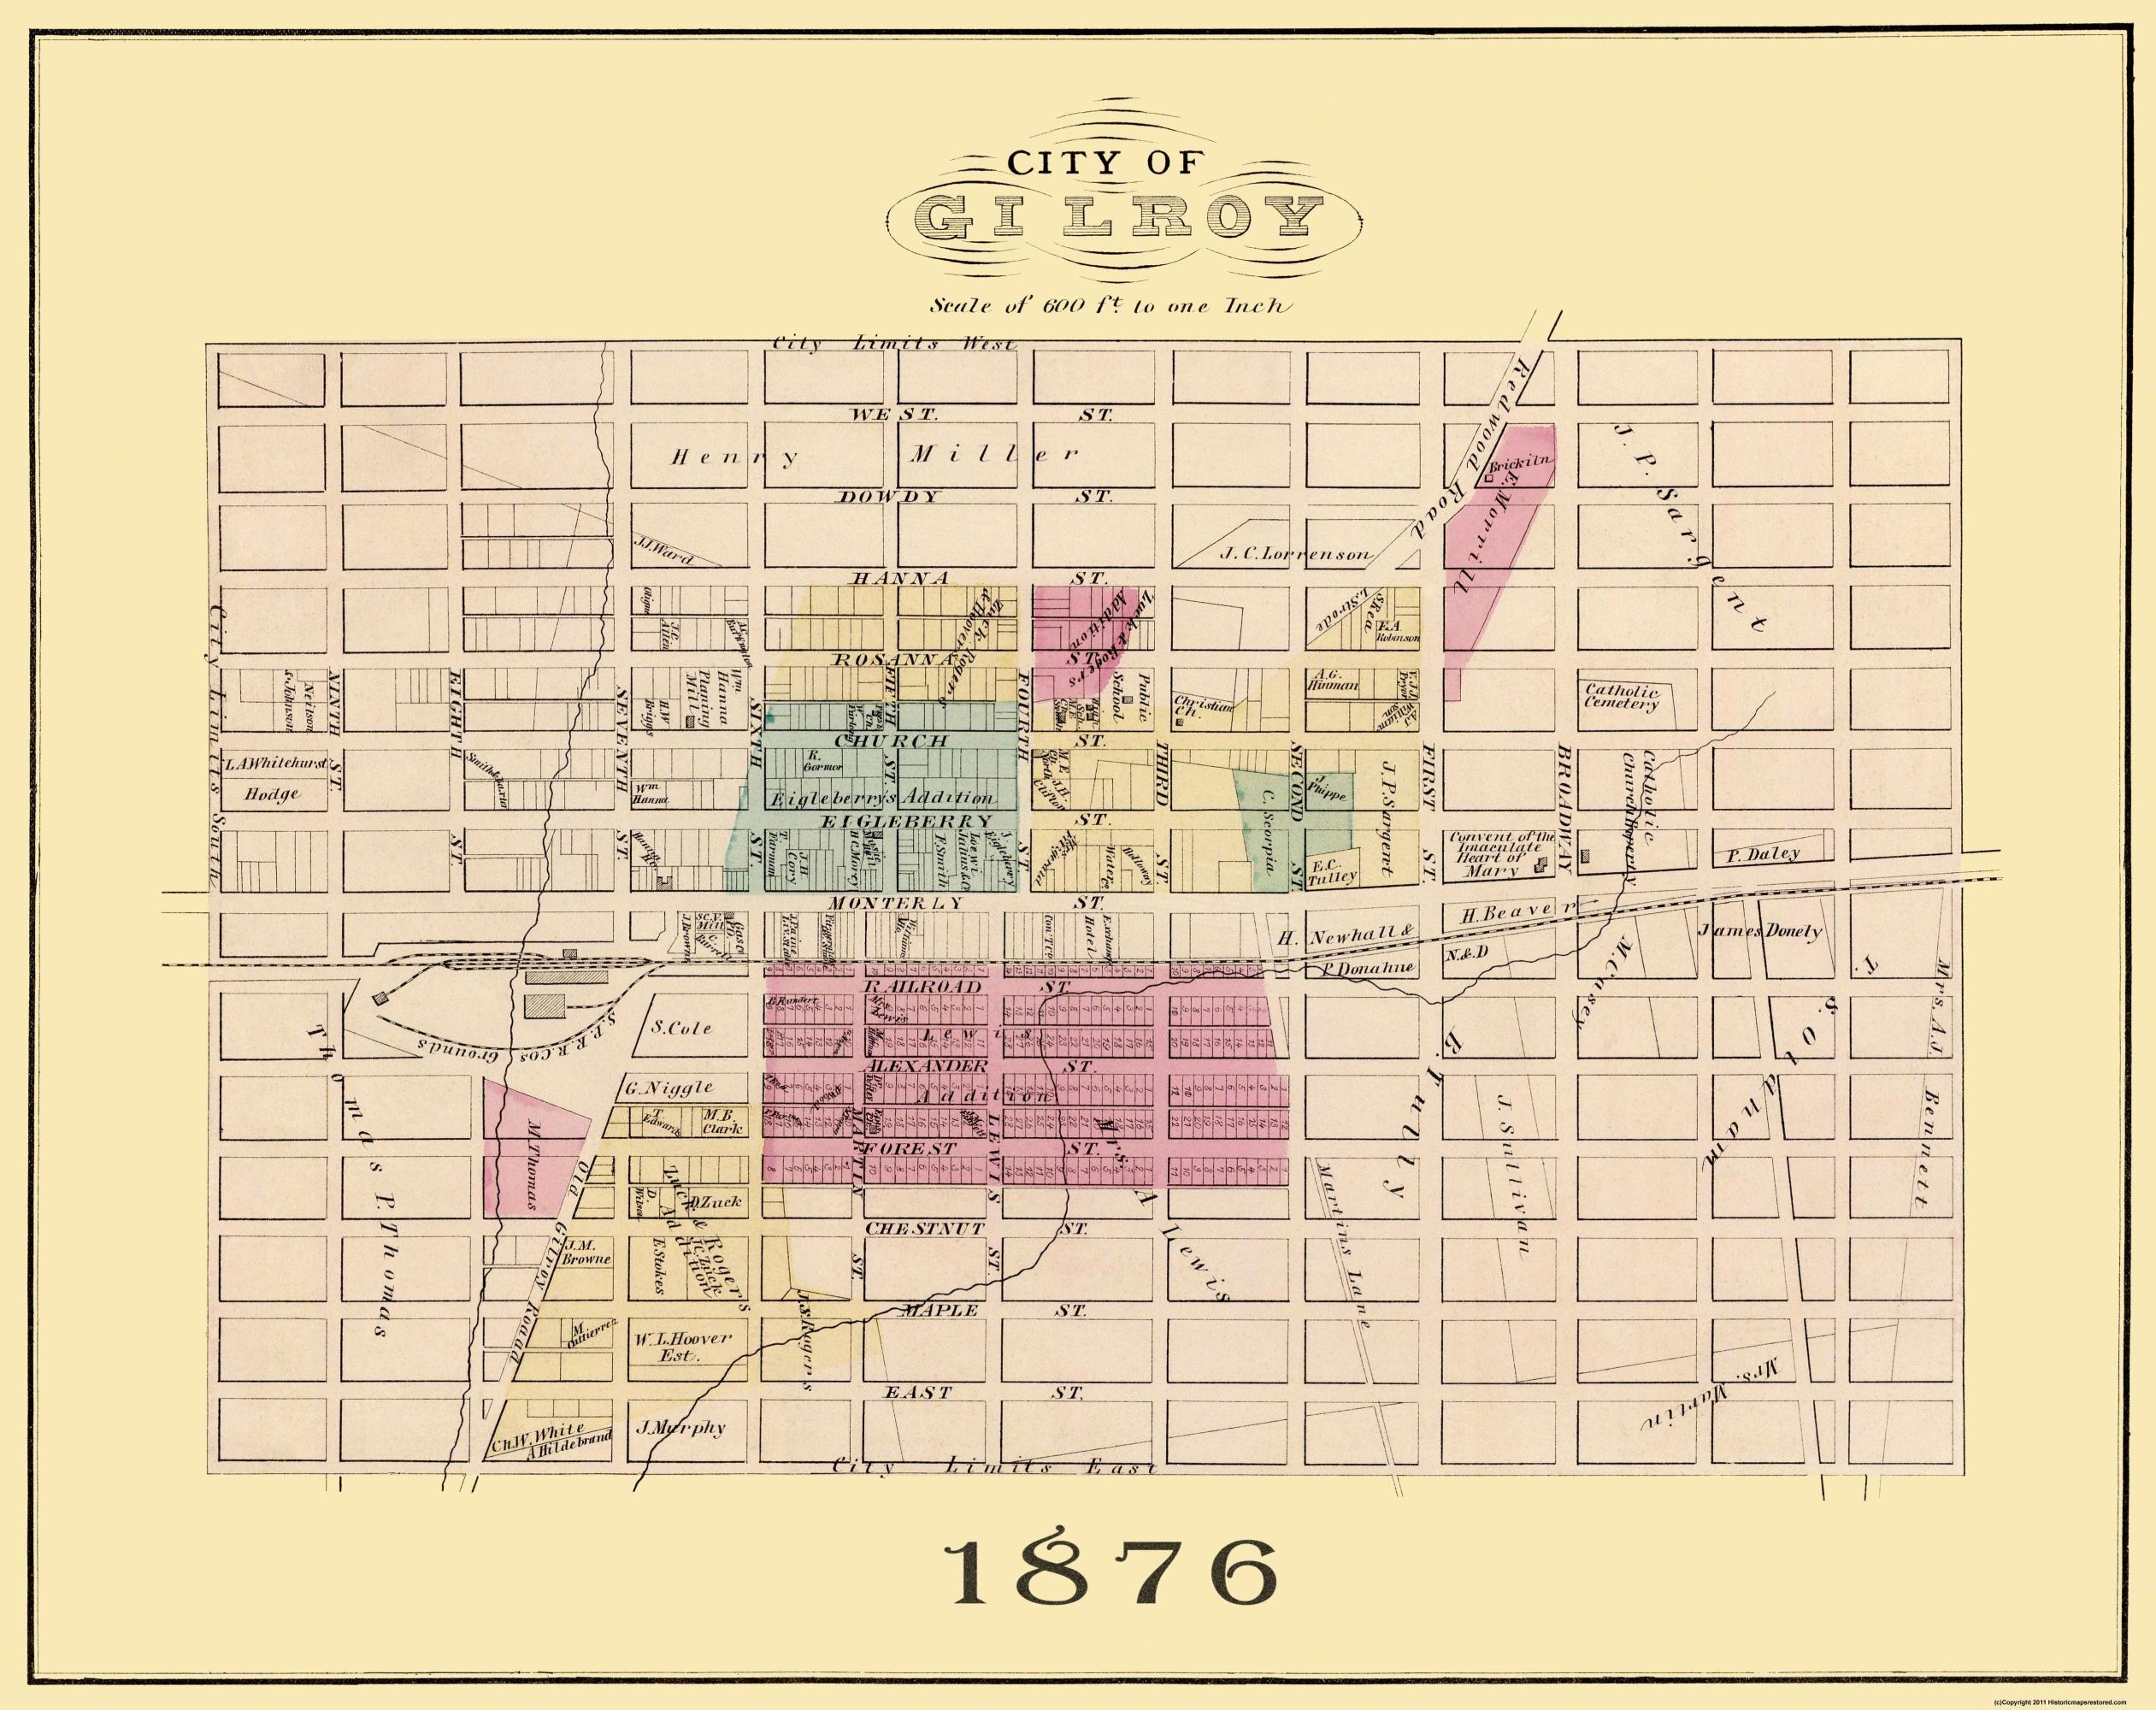 Old City Map Gilroy California Landowner 1876